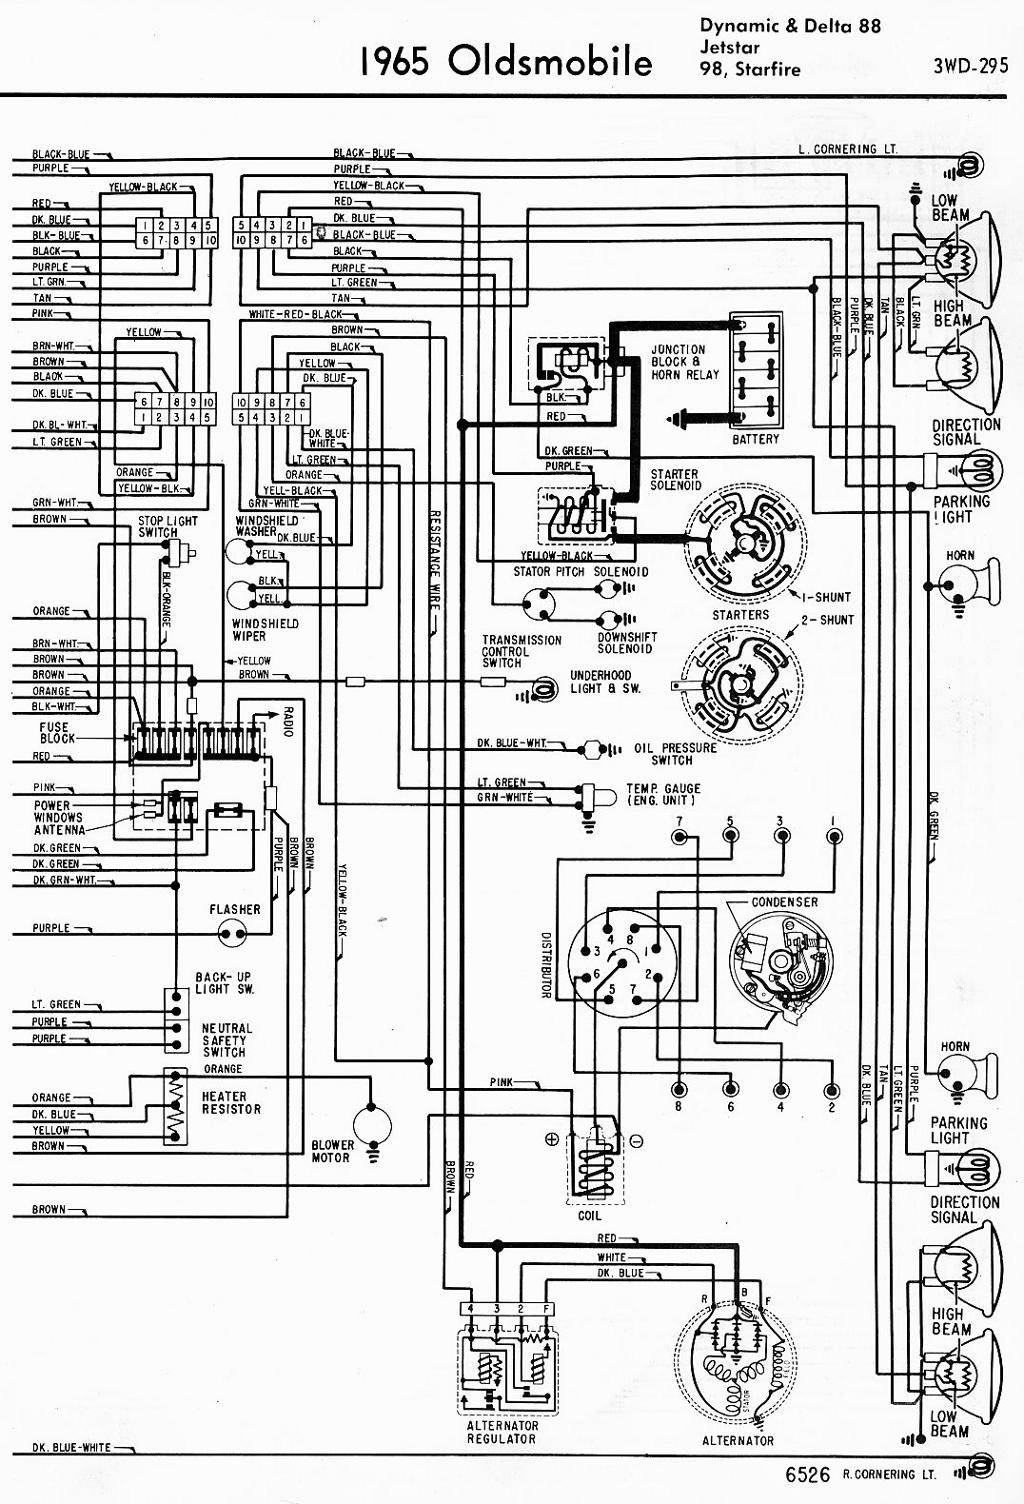 Daihatsu Alternator Wiring Diagram Austinthirdgen Org And Camaro 1997 F150 Harness Kits Free Download Isuzu Npr Additionally Oldsmobile 88 Fuse Box 98 Frr Alternater